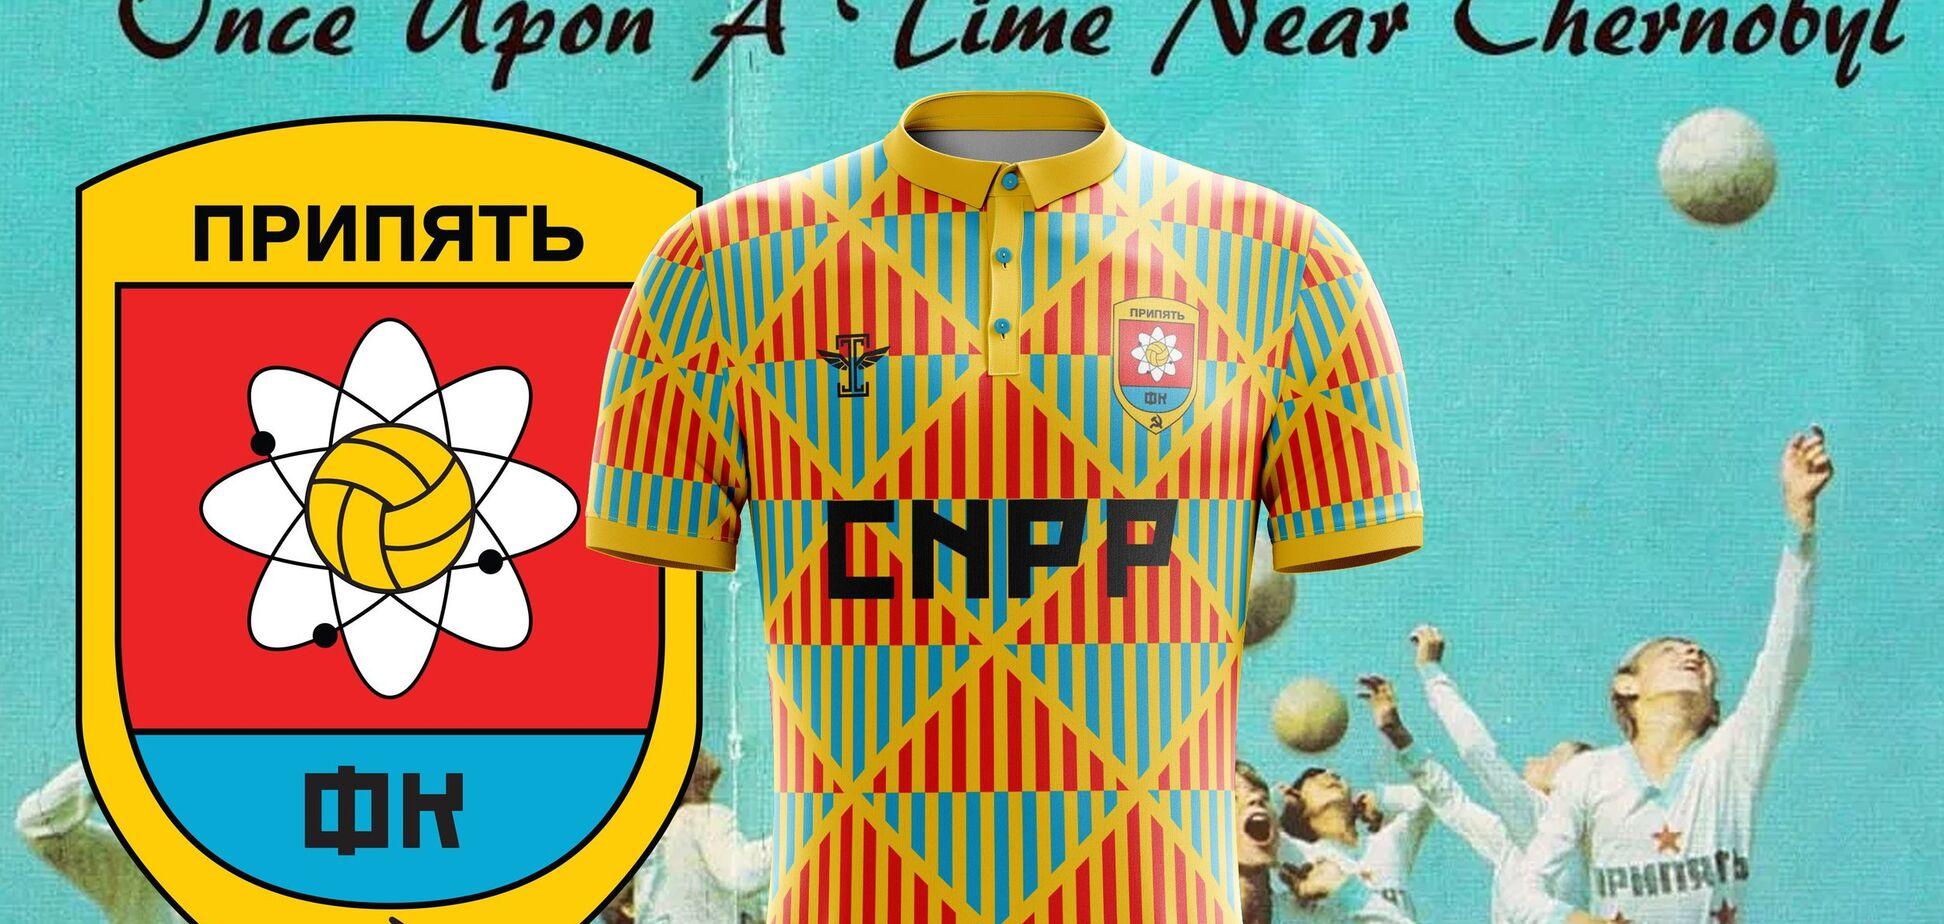 'Спонсор Чорнобильська АЕС': форму футбольного клубу з Прип'яті продають в США